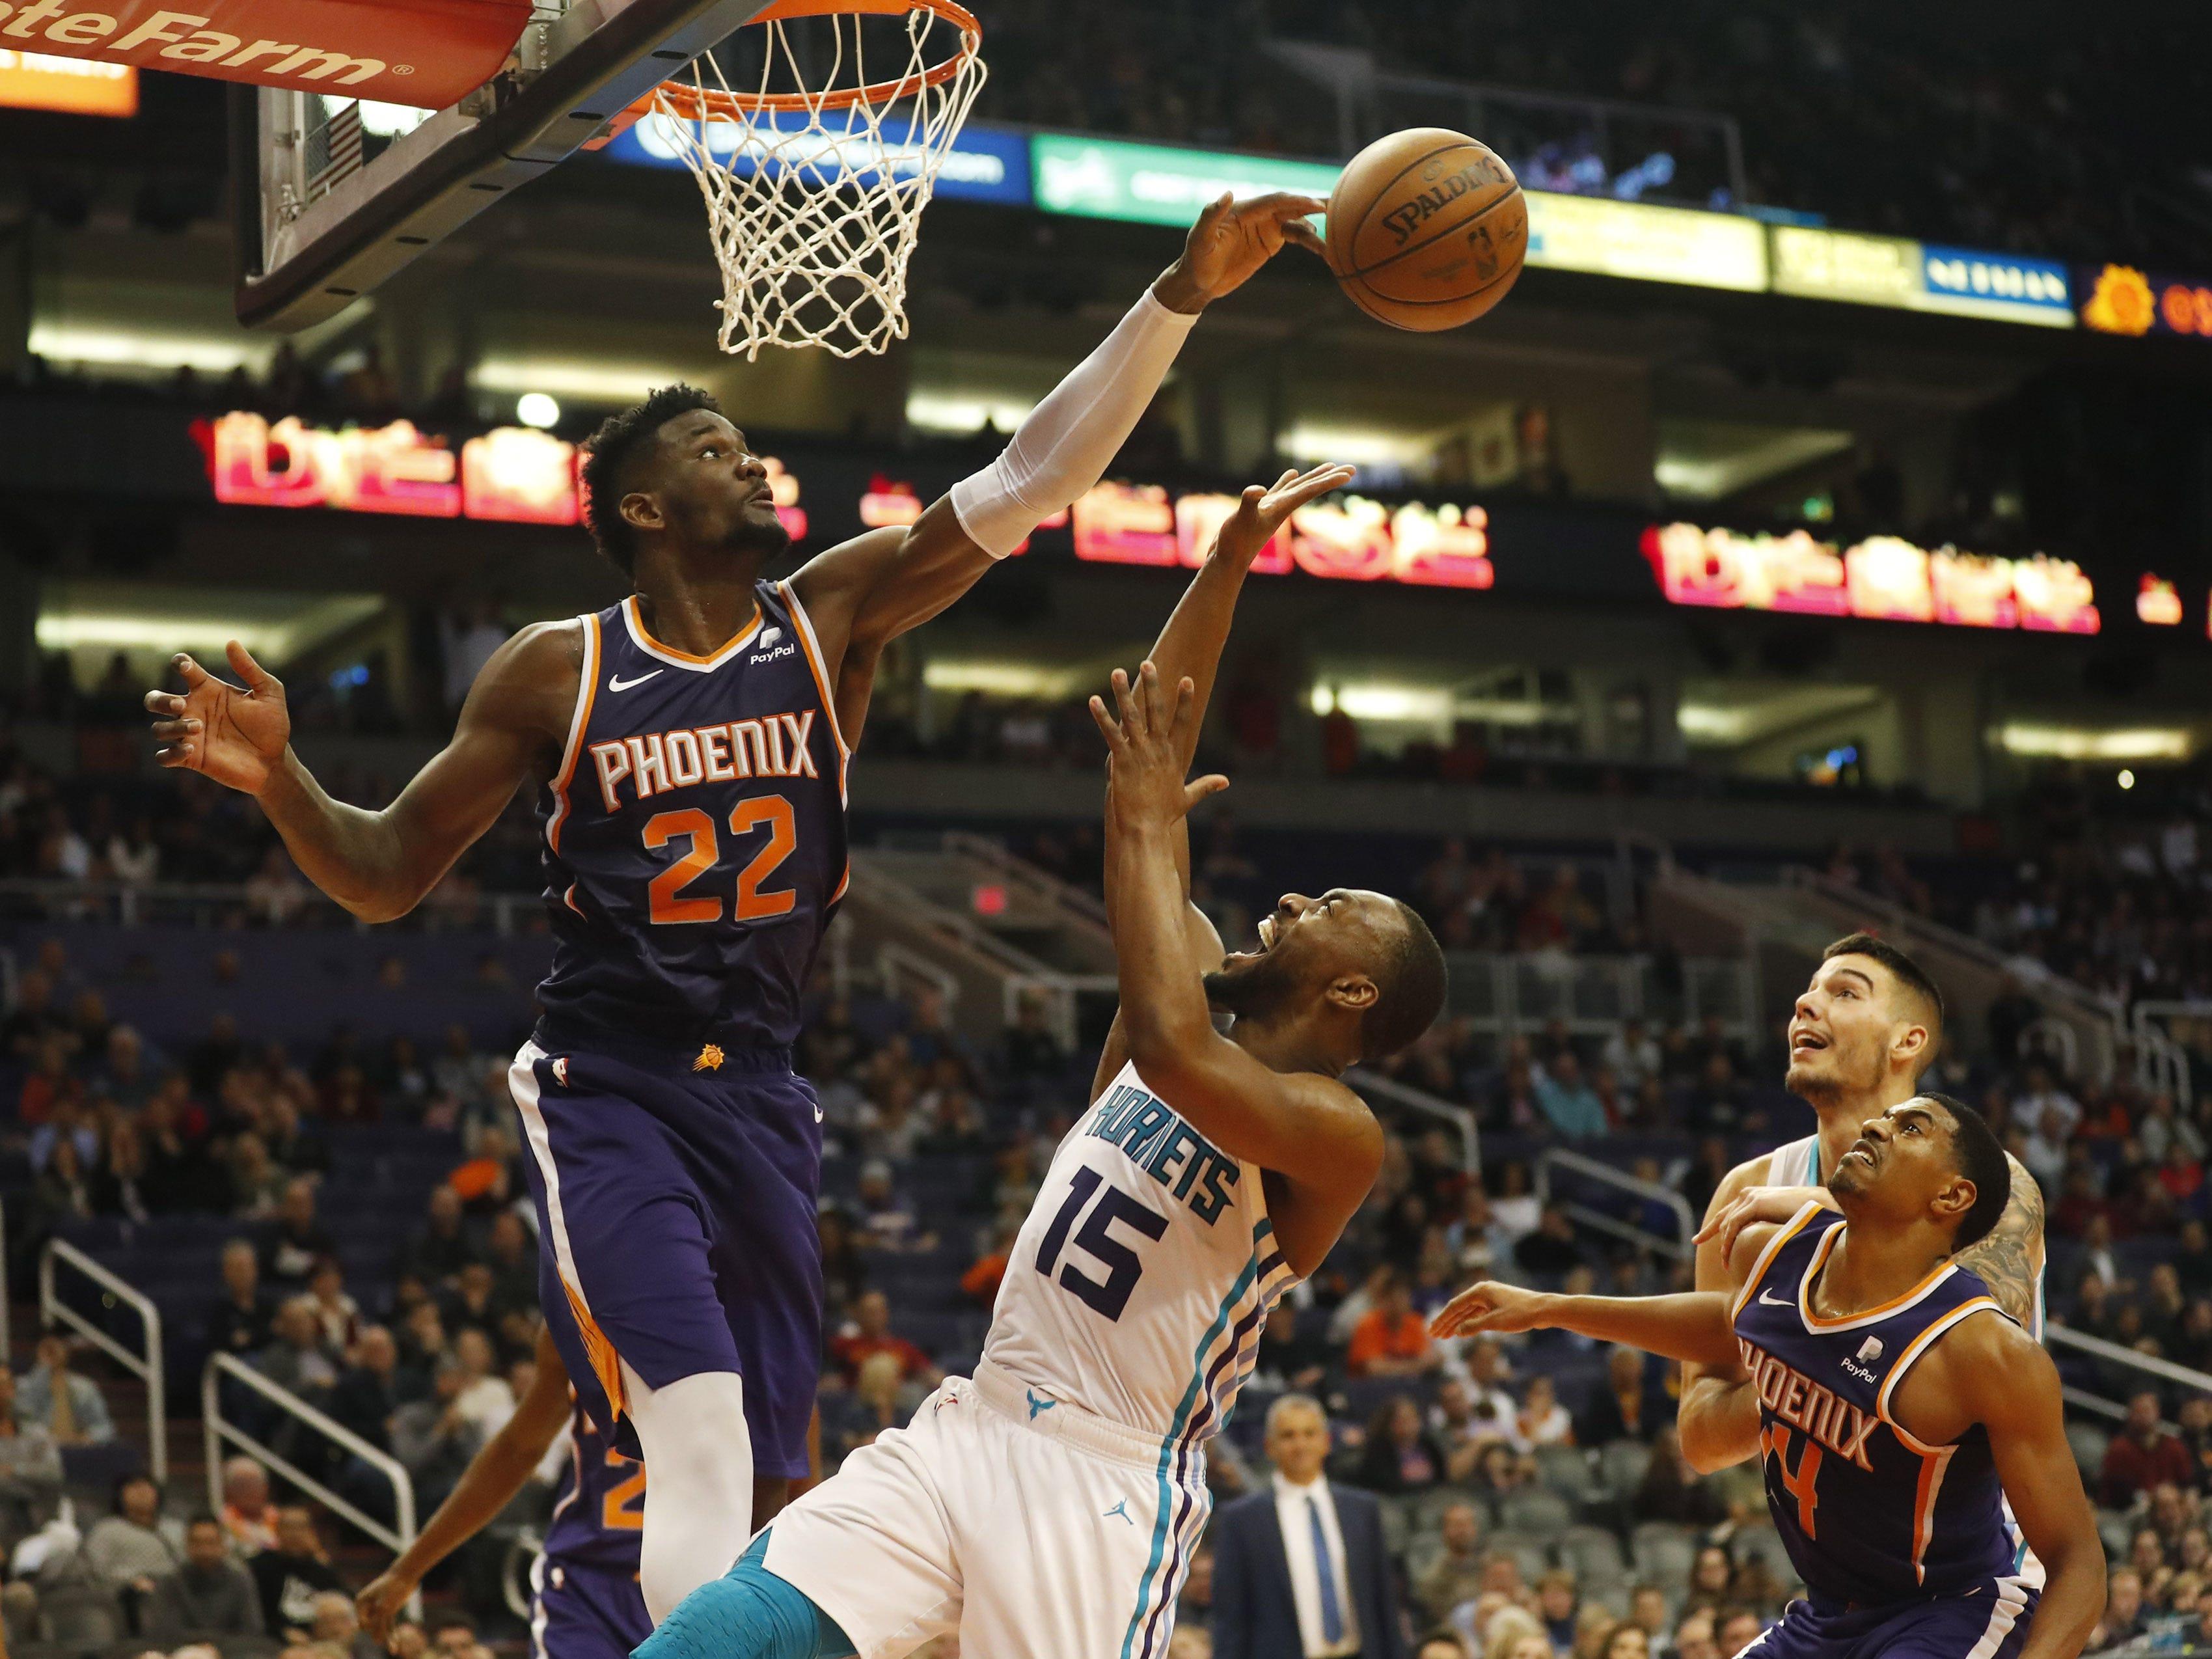 Phoenix Suns center Deandre Ayton (22) blocks a shot by Charlotte Hornets guard Kemba Walker (15) during the fourth quarter in Phoenix January 6, 2019.